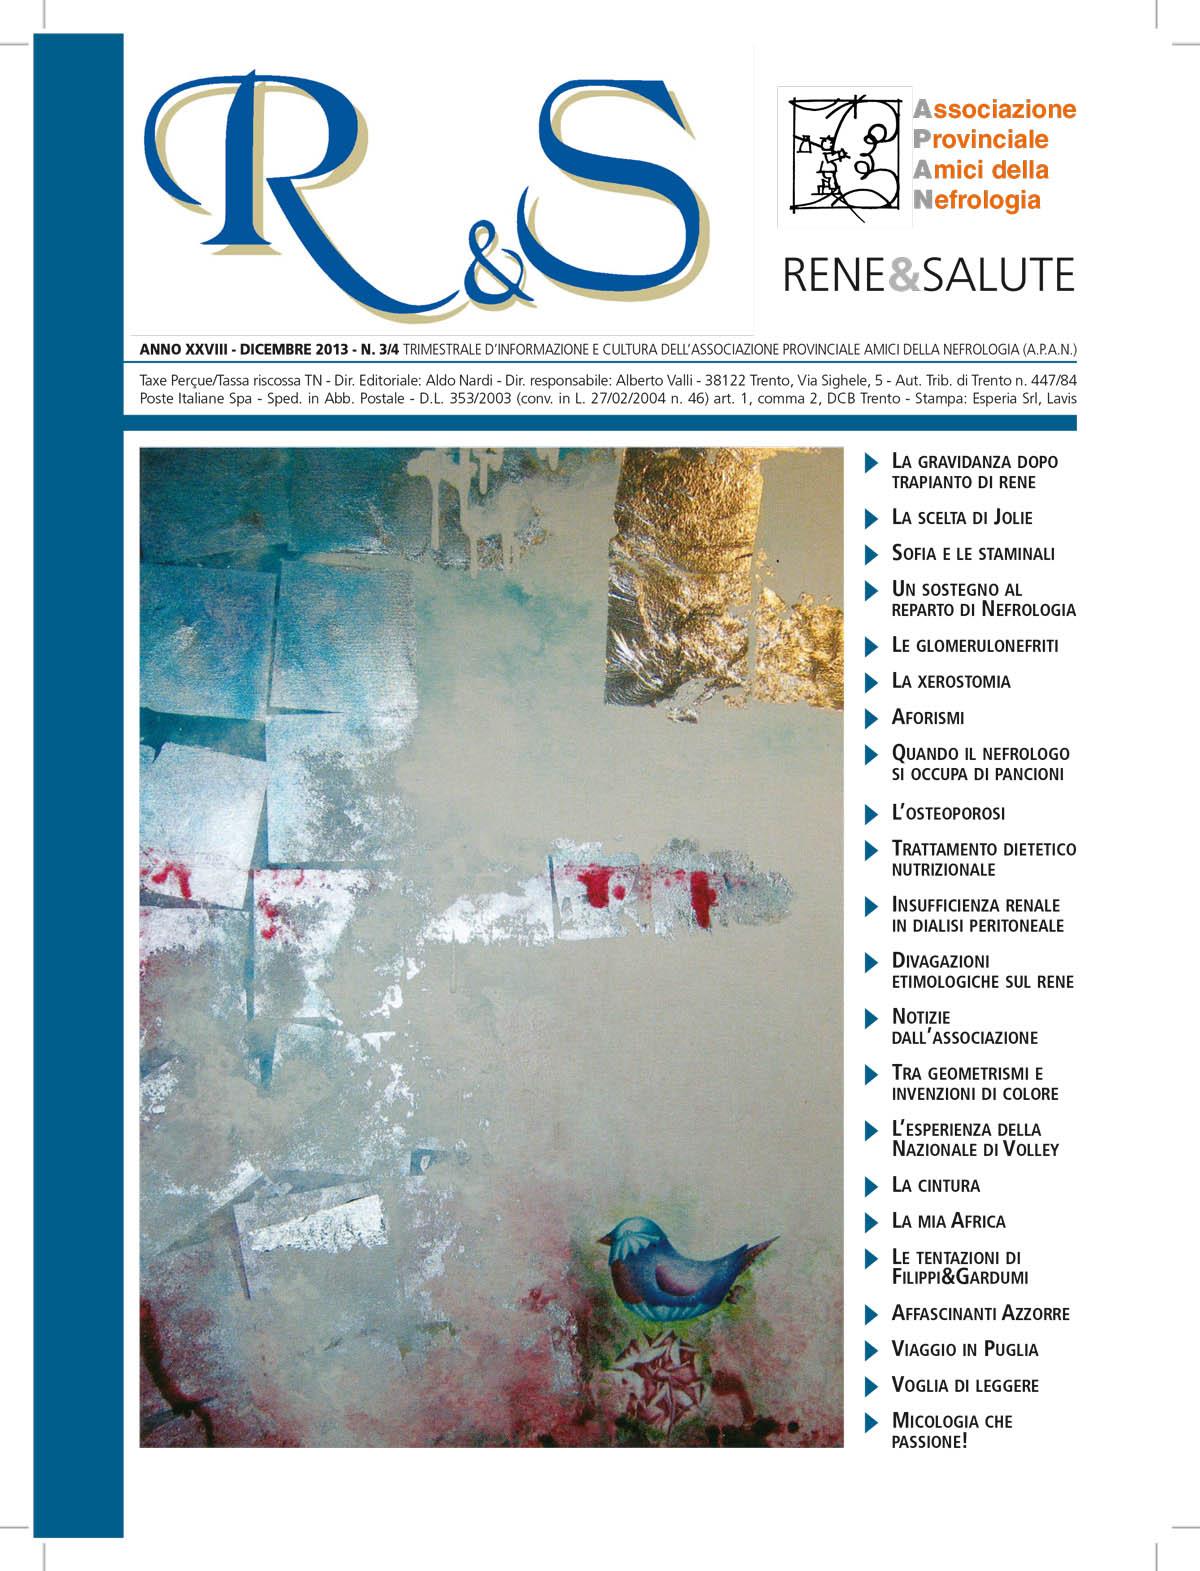 Rene & Salute 2013.3-4